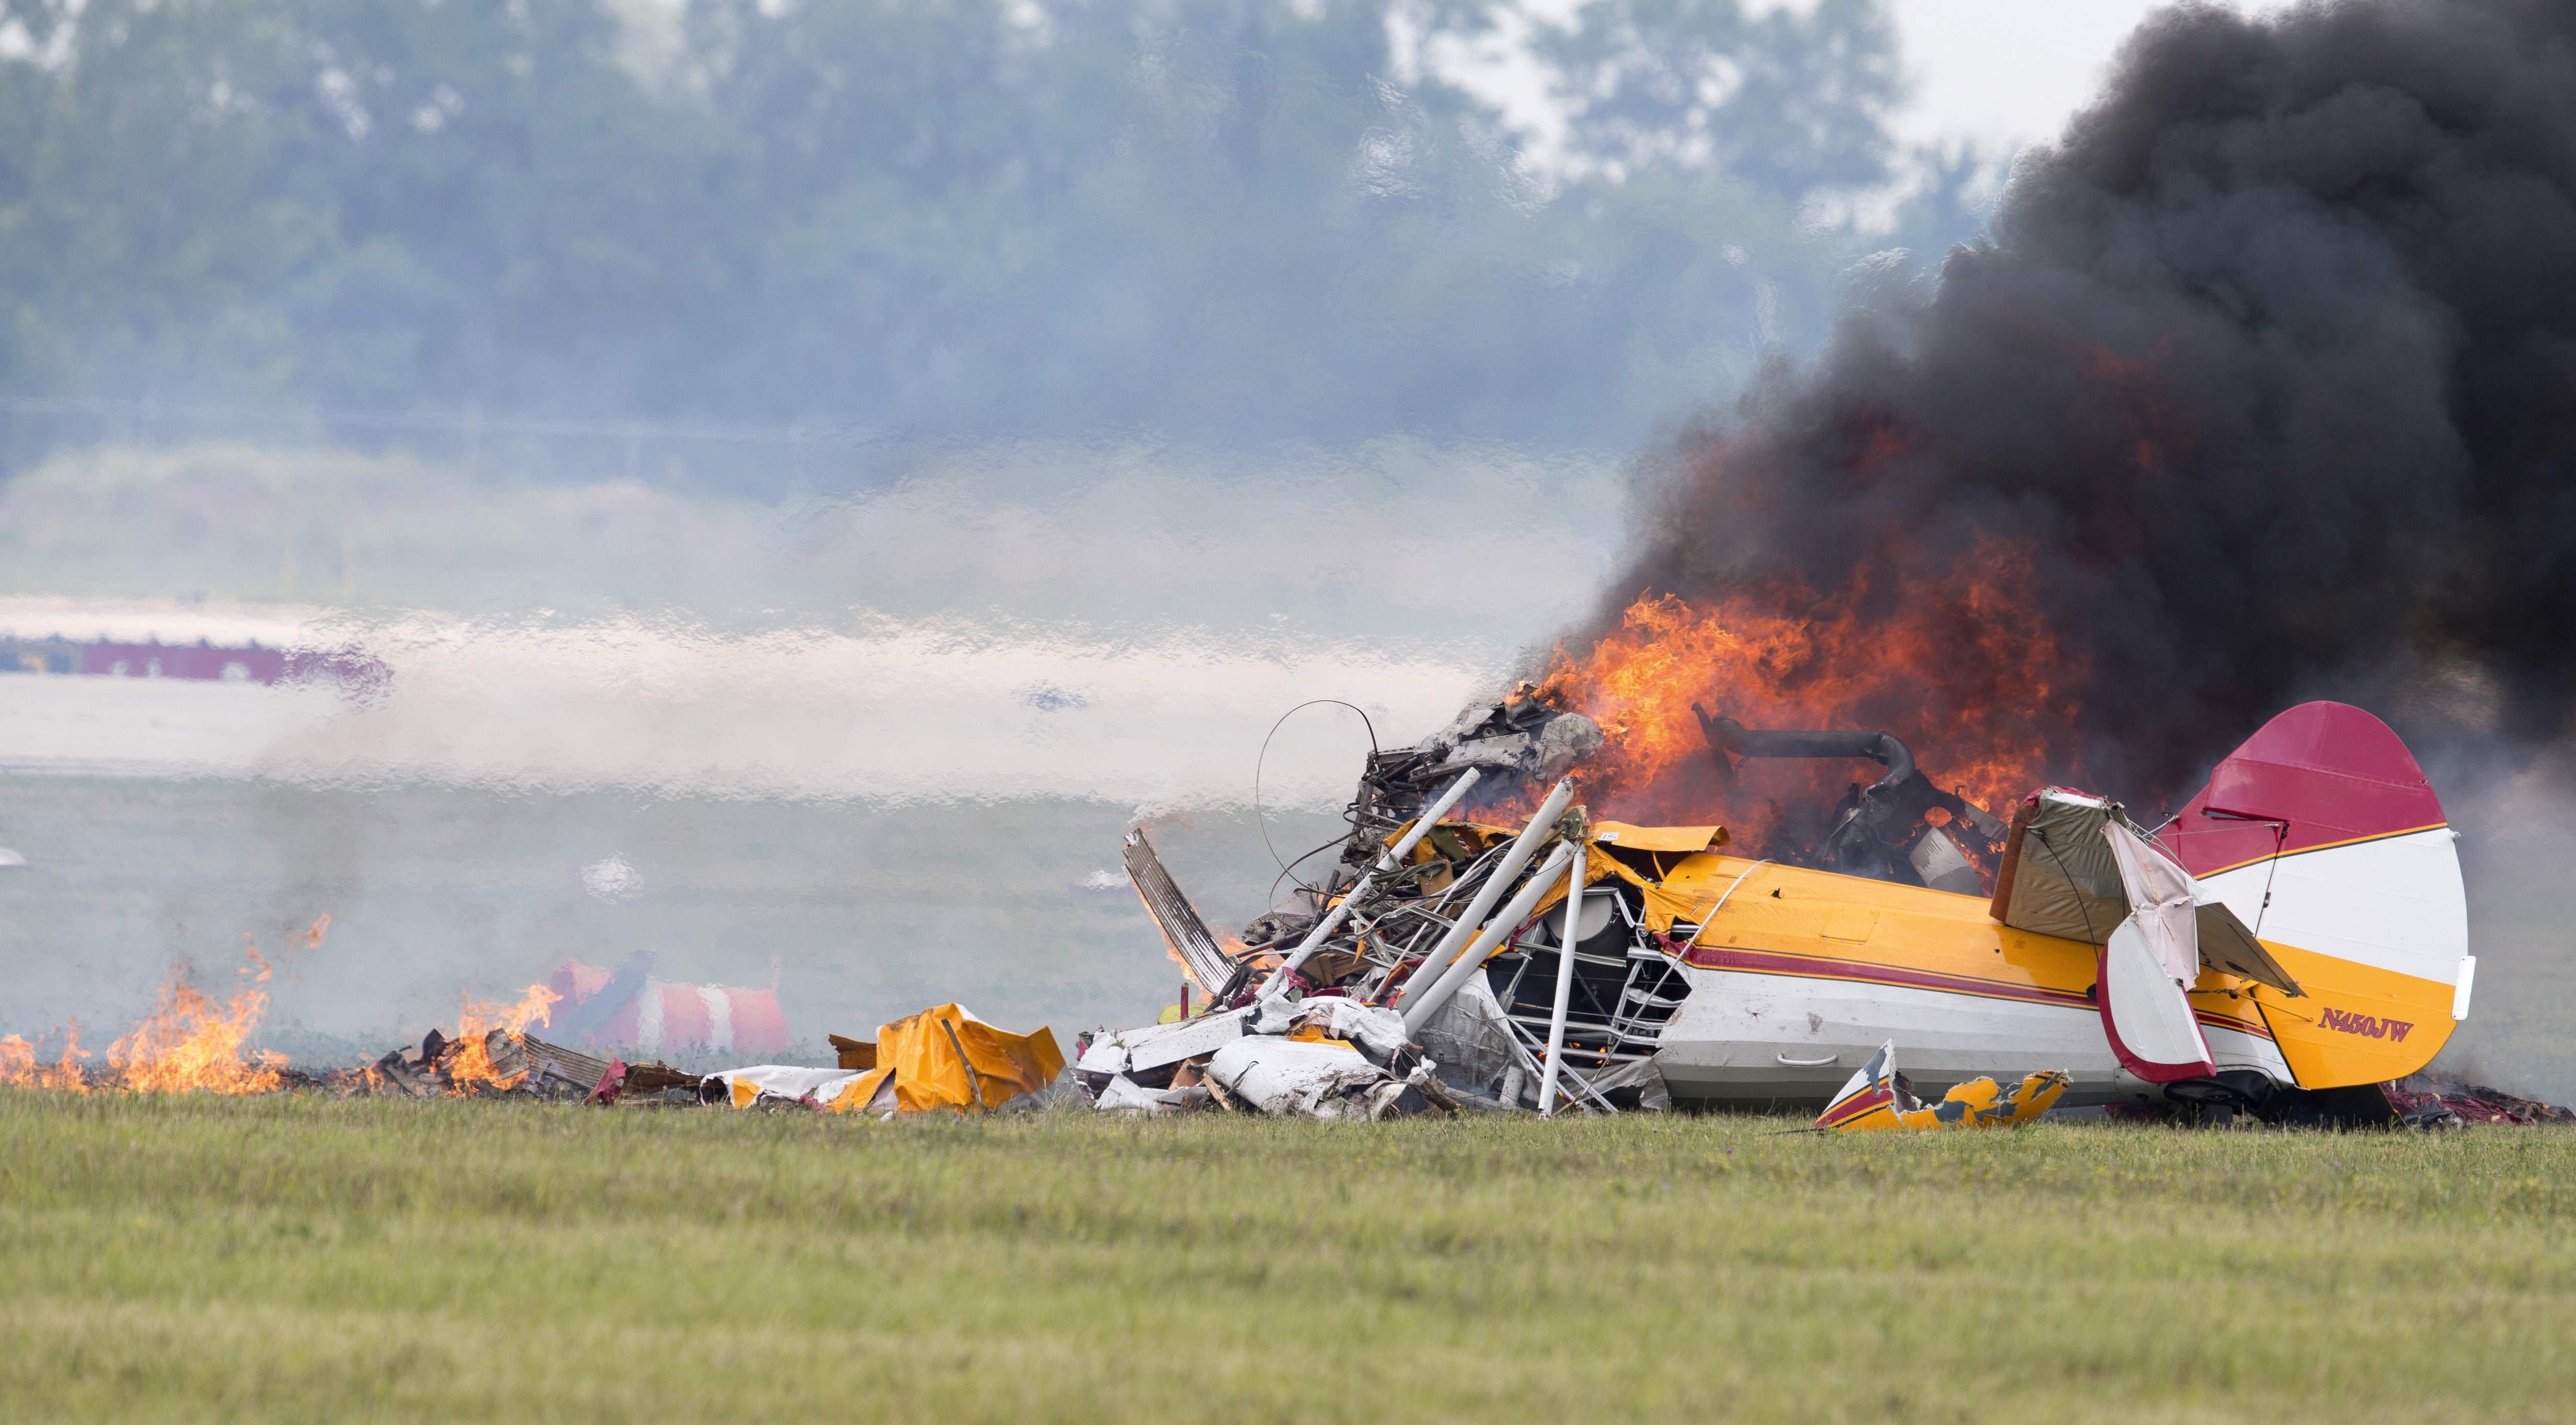 airplane plane aircraft crash fire explosion wallpaper background 4937x2731